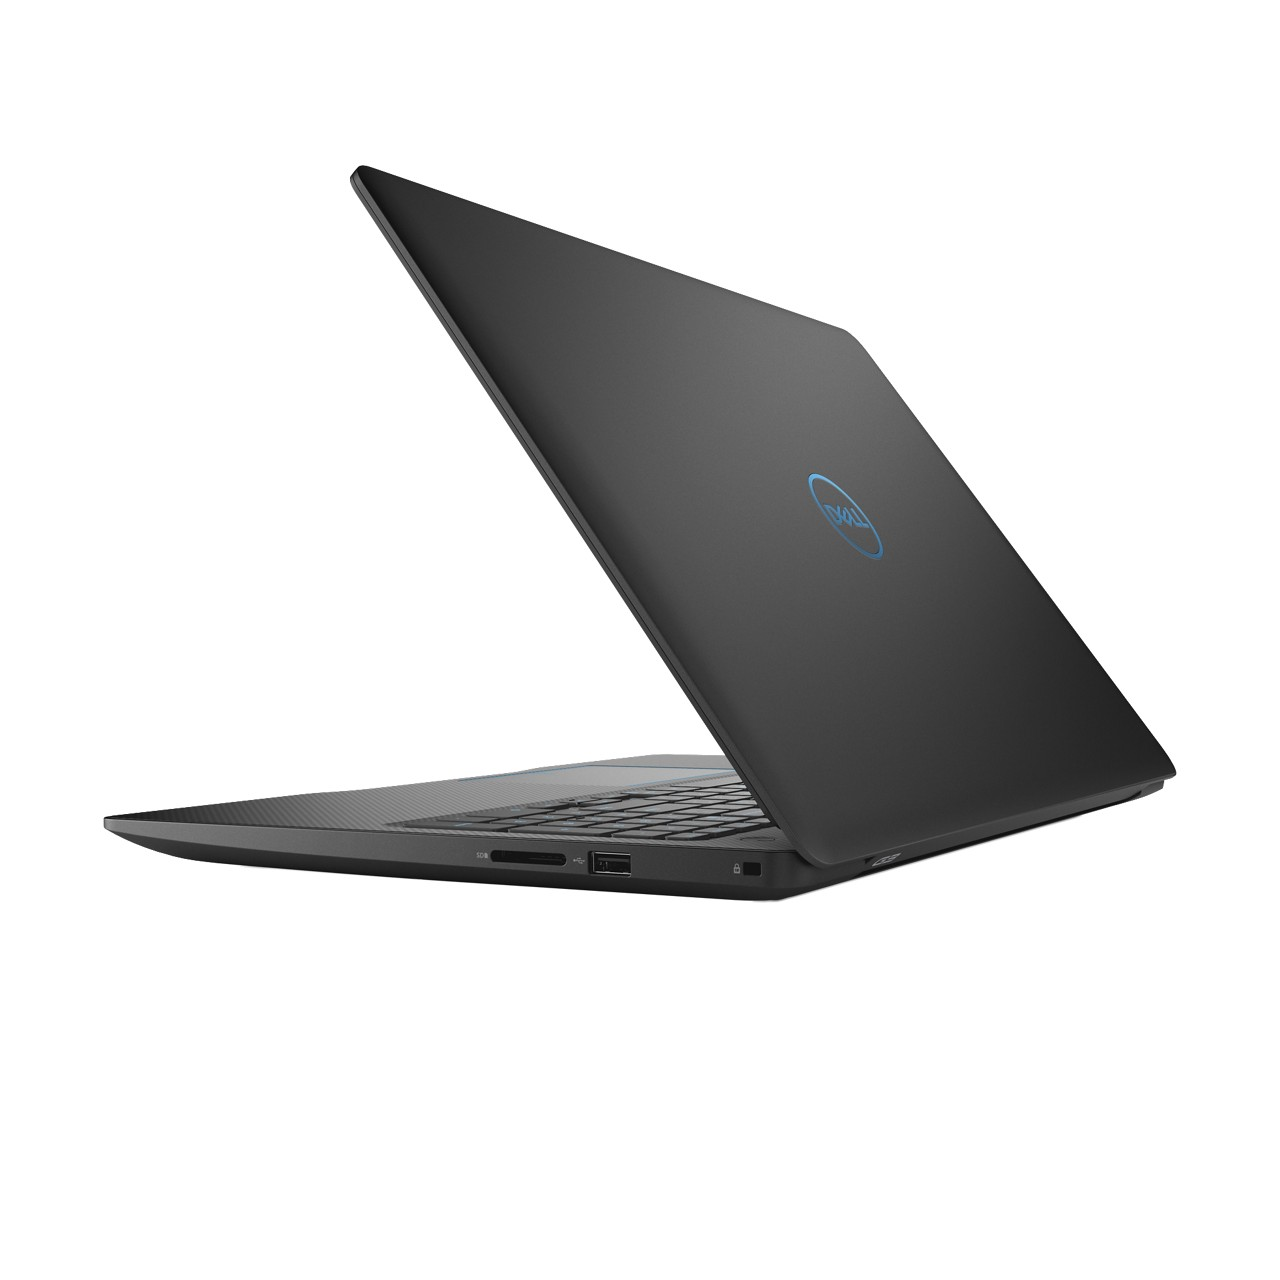 "Dell G3 Gaming Laptop 15.6"" Full HD, Intel Core i5-8300H, NVIDIA GeForce GTX 1050 4GB, 1TB HHD Storage, 8GB RAM, G3579-5958BLK"